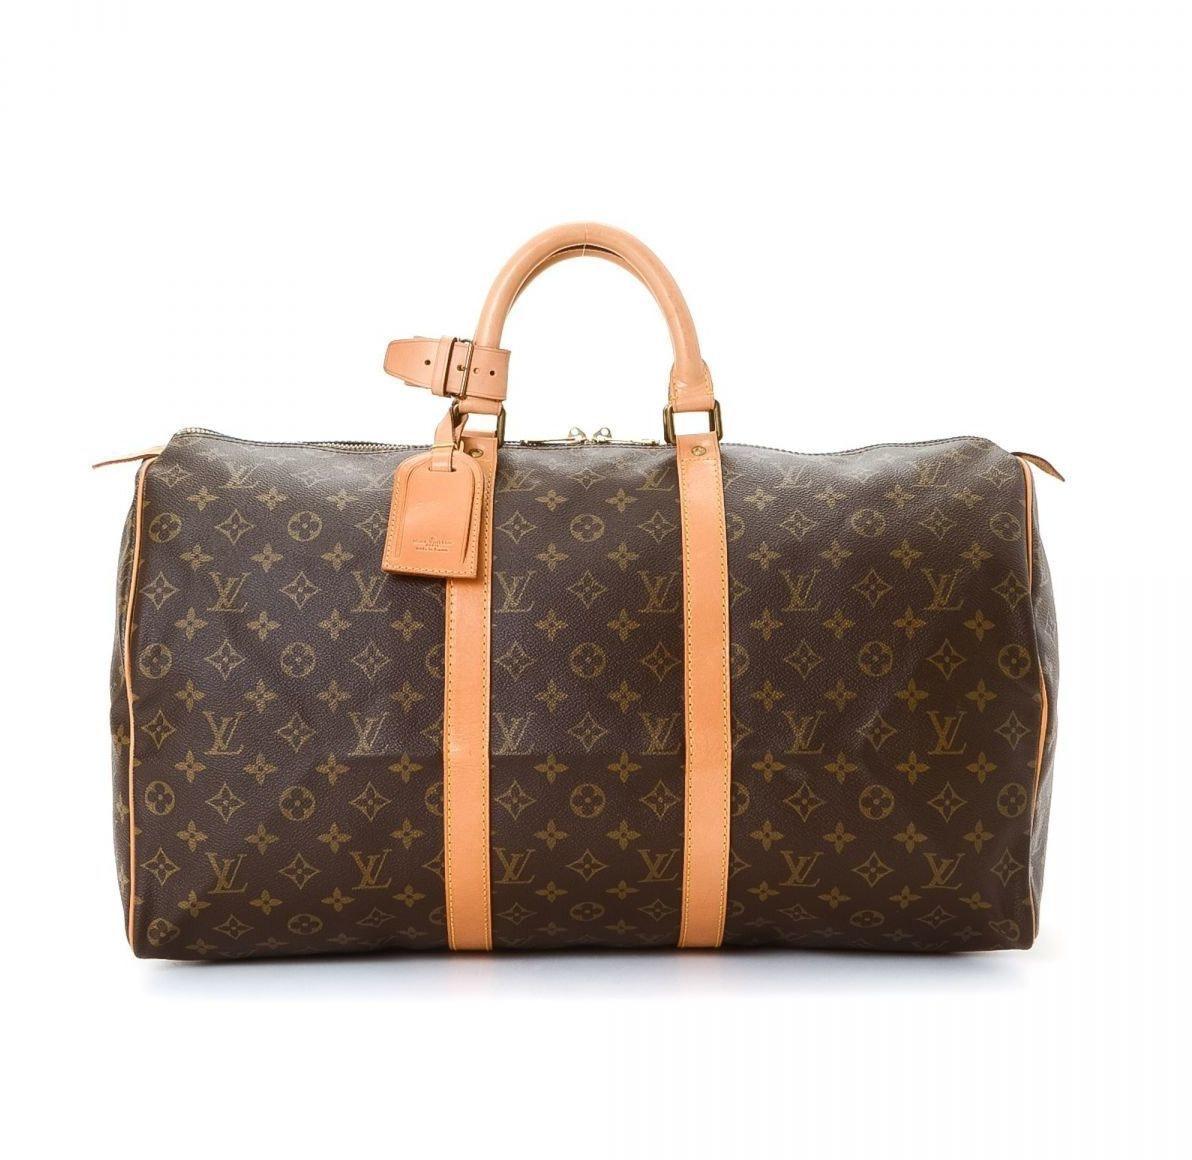 Louis Vuitton Keepall Monogram 50 Brown